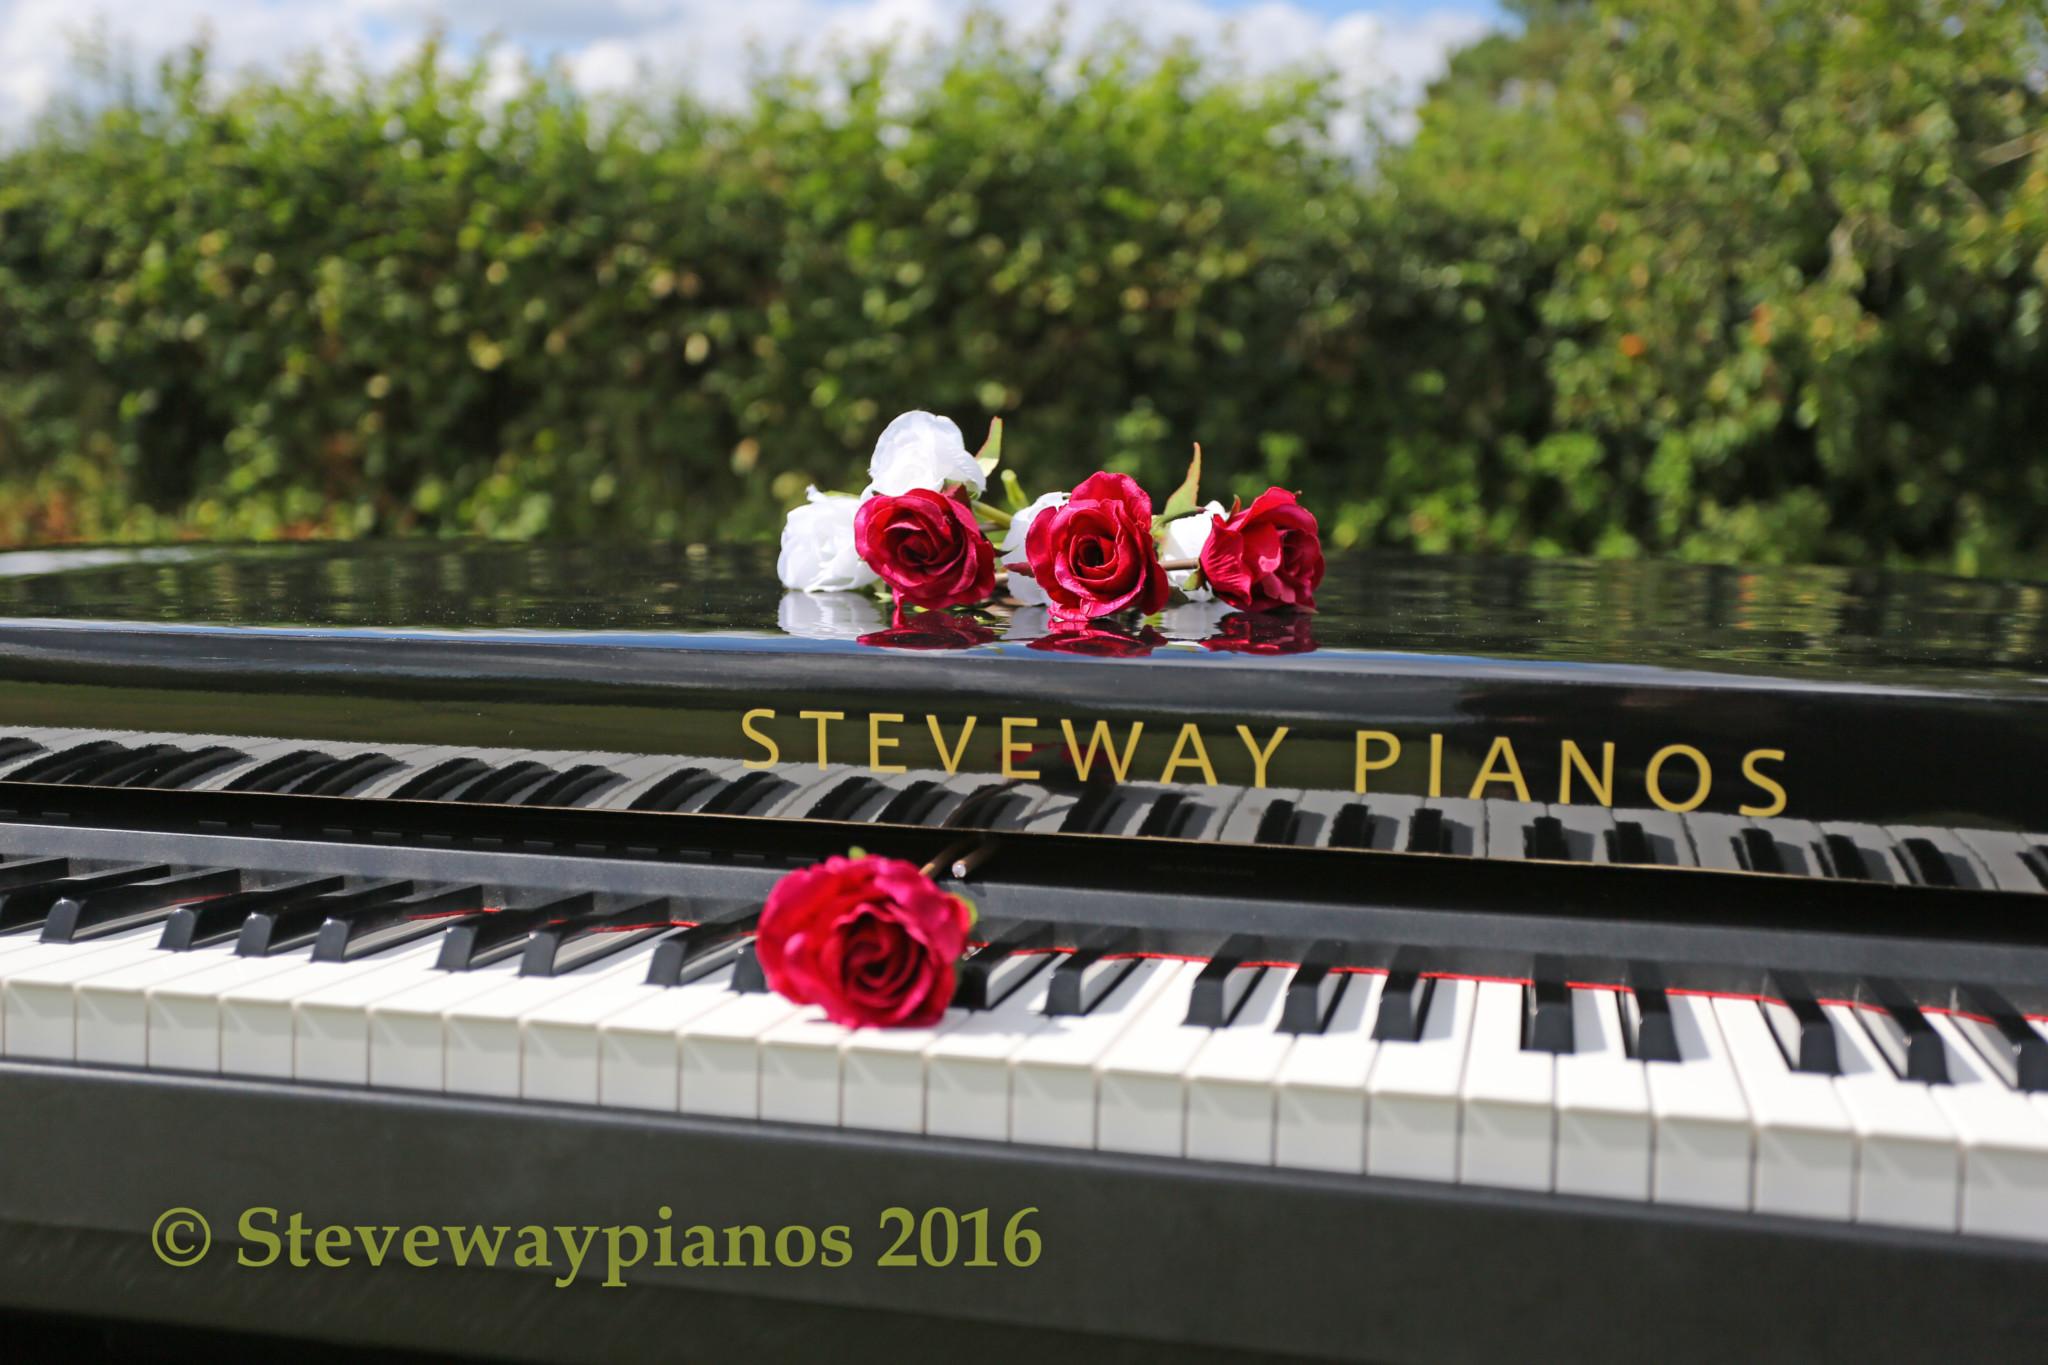 Steveway Pianos